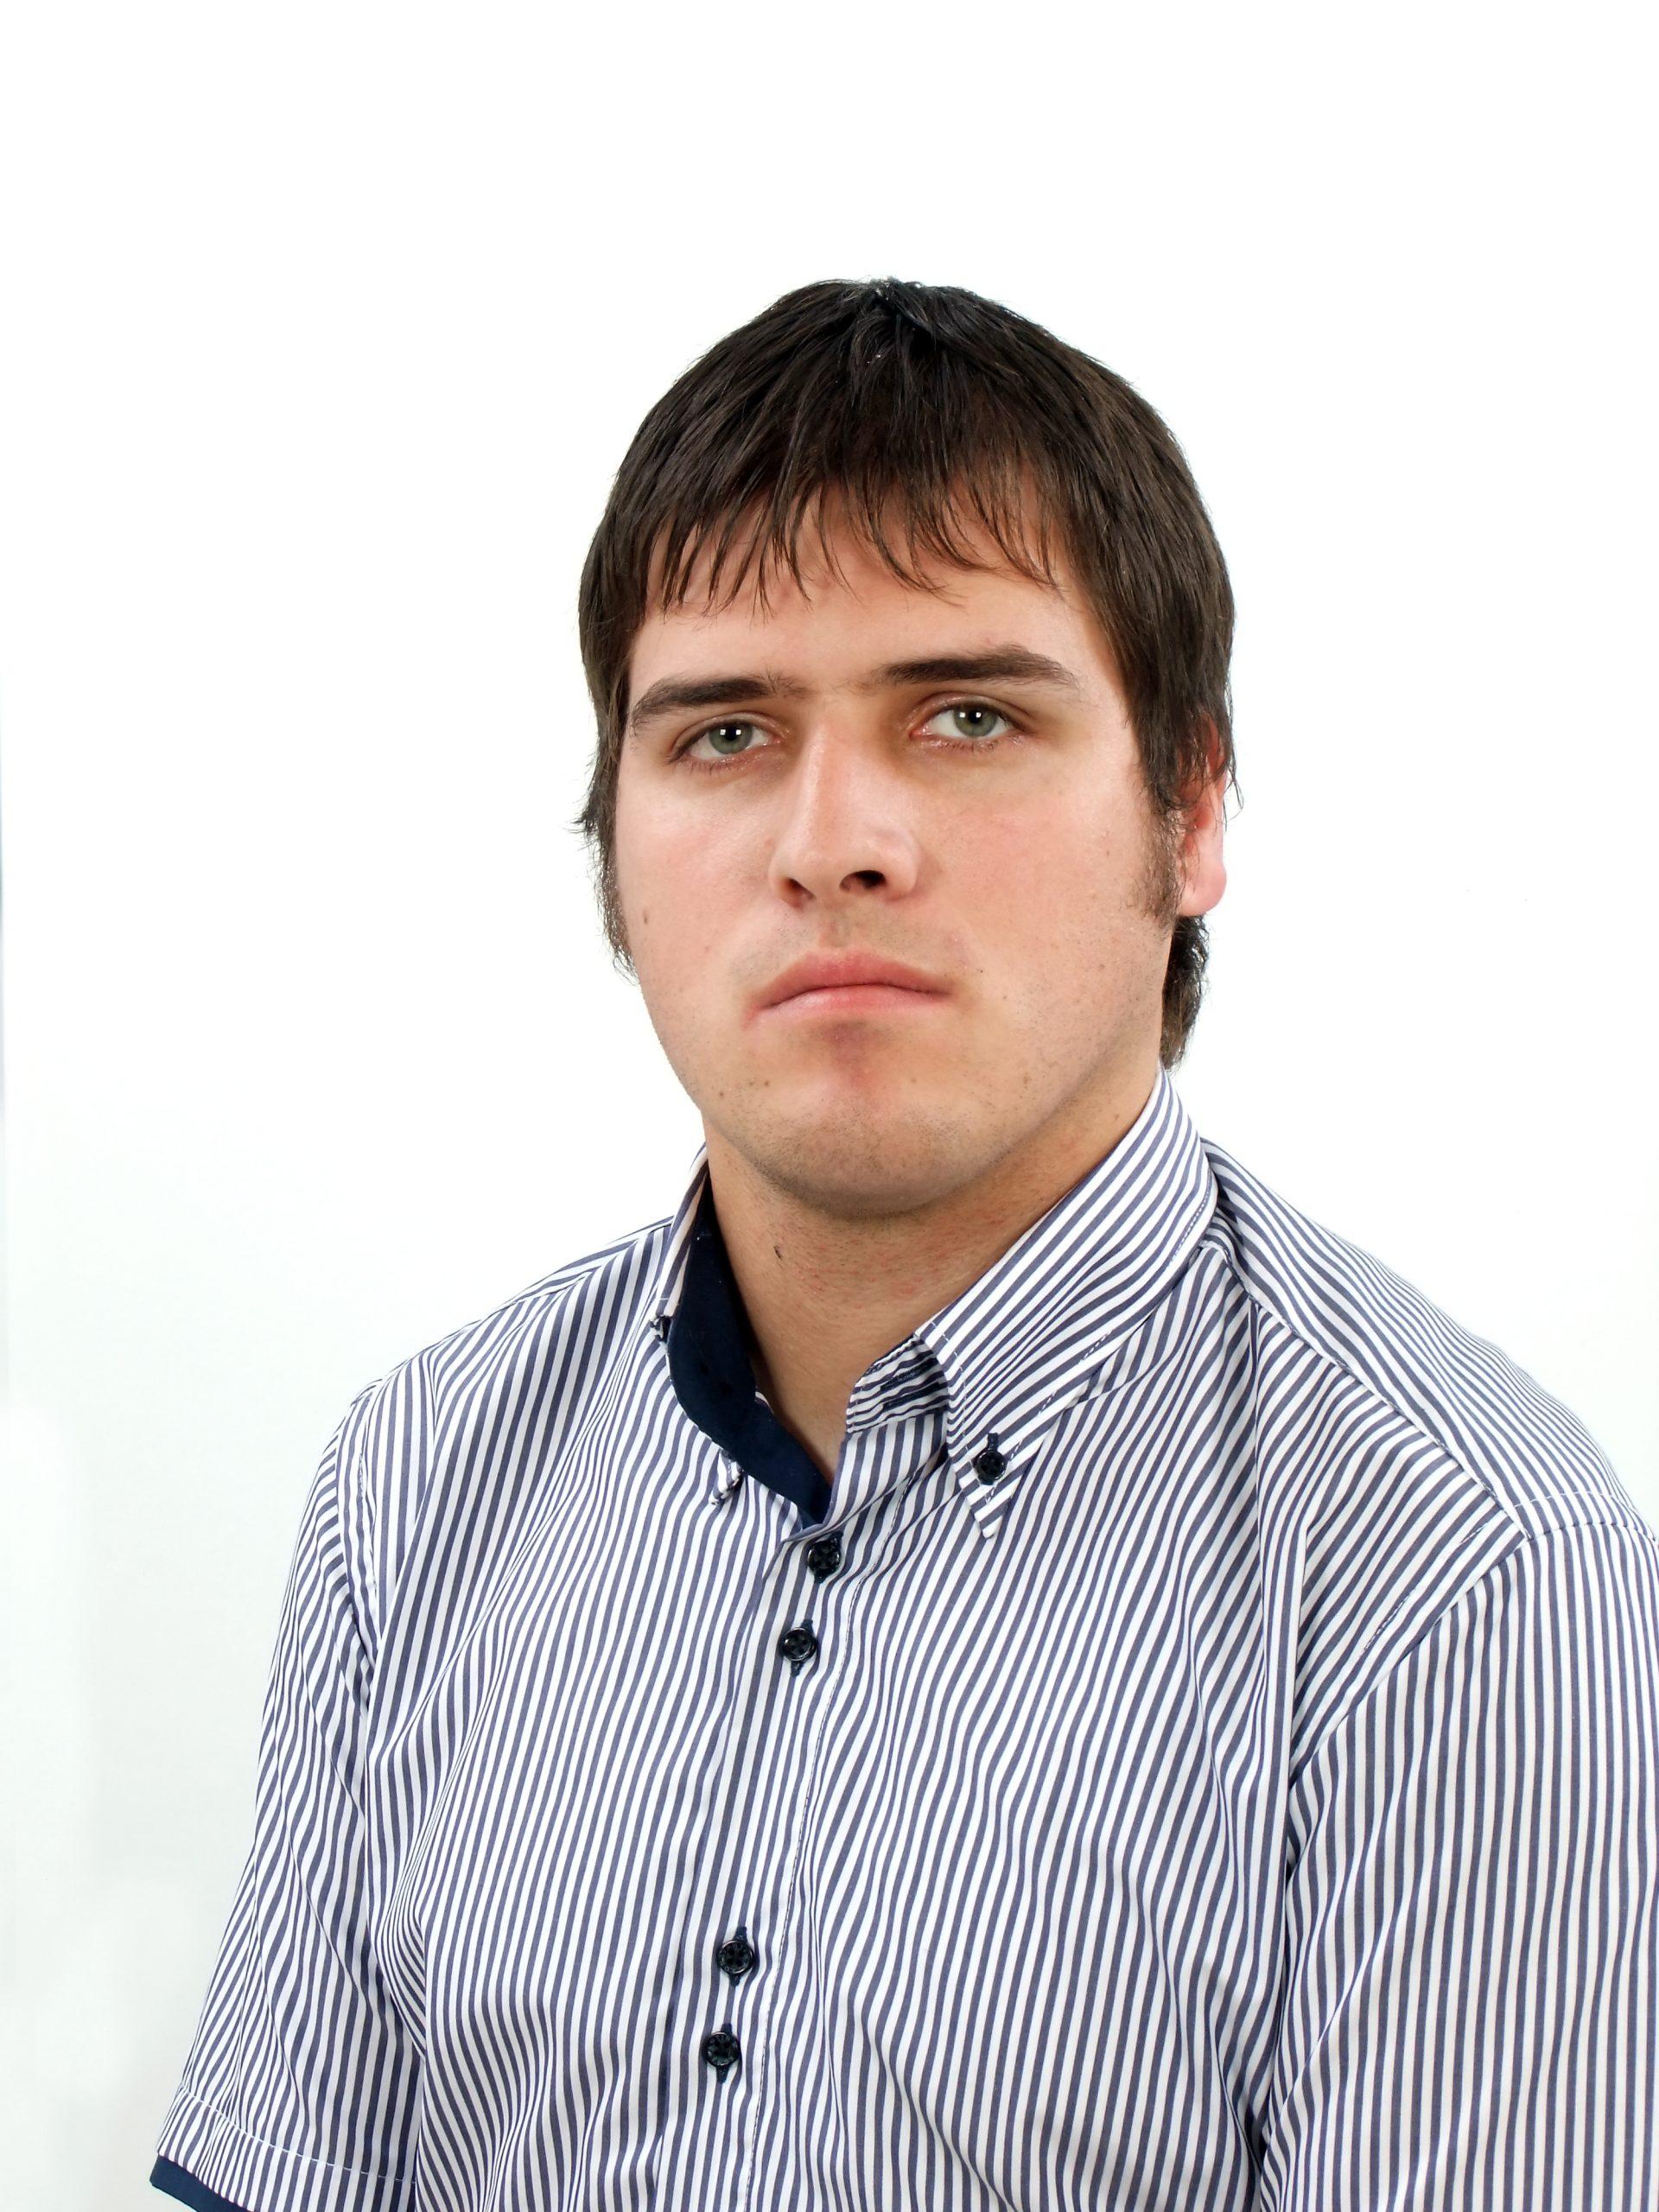 Milos Popic